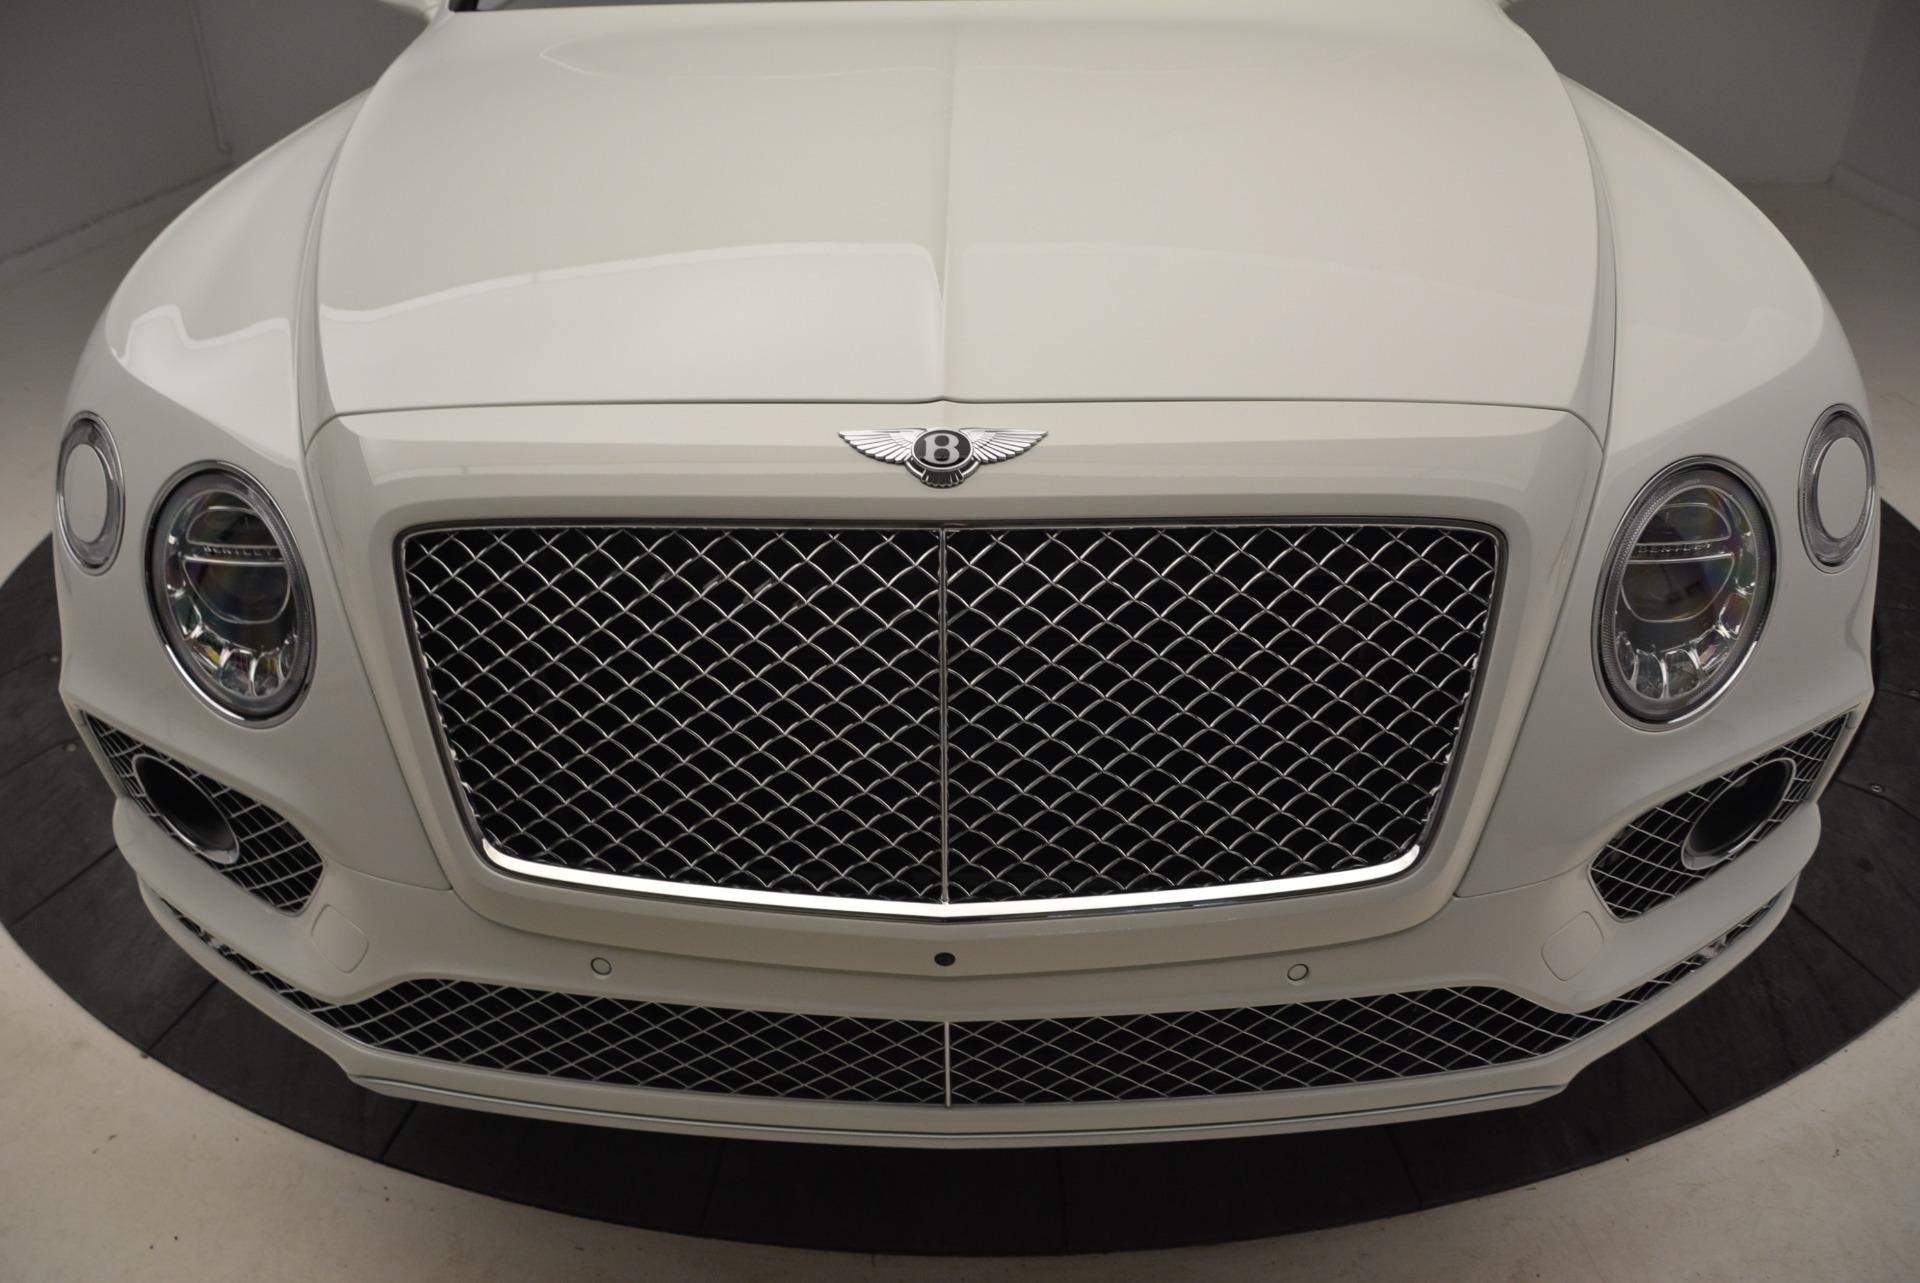 Used 2018 Bentley Bentayga Activity Edition For Sale In Westport, CT 1922_p13